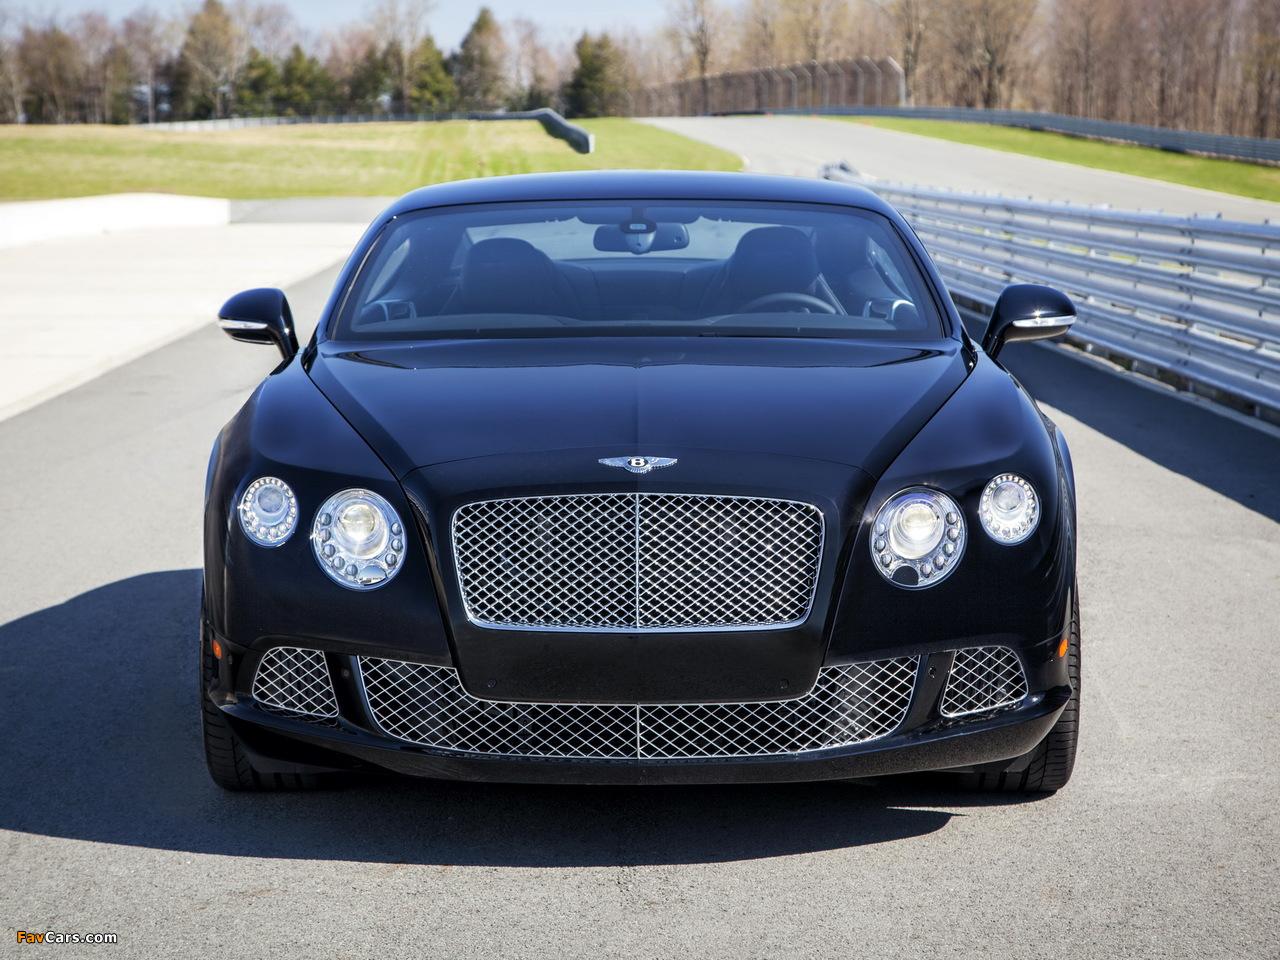 Bentley Continental GT Speed Le Mans Edition 2013 photos (1280 x 960)